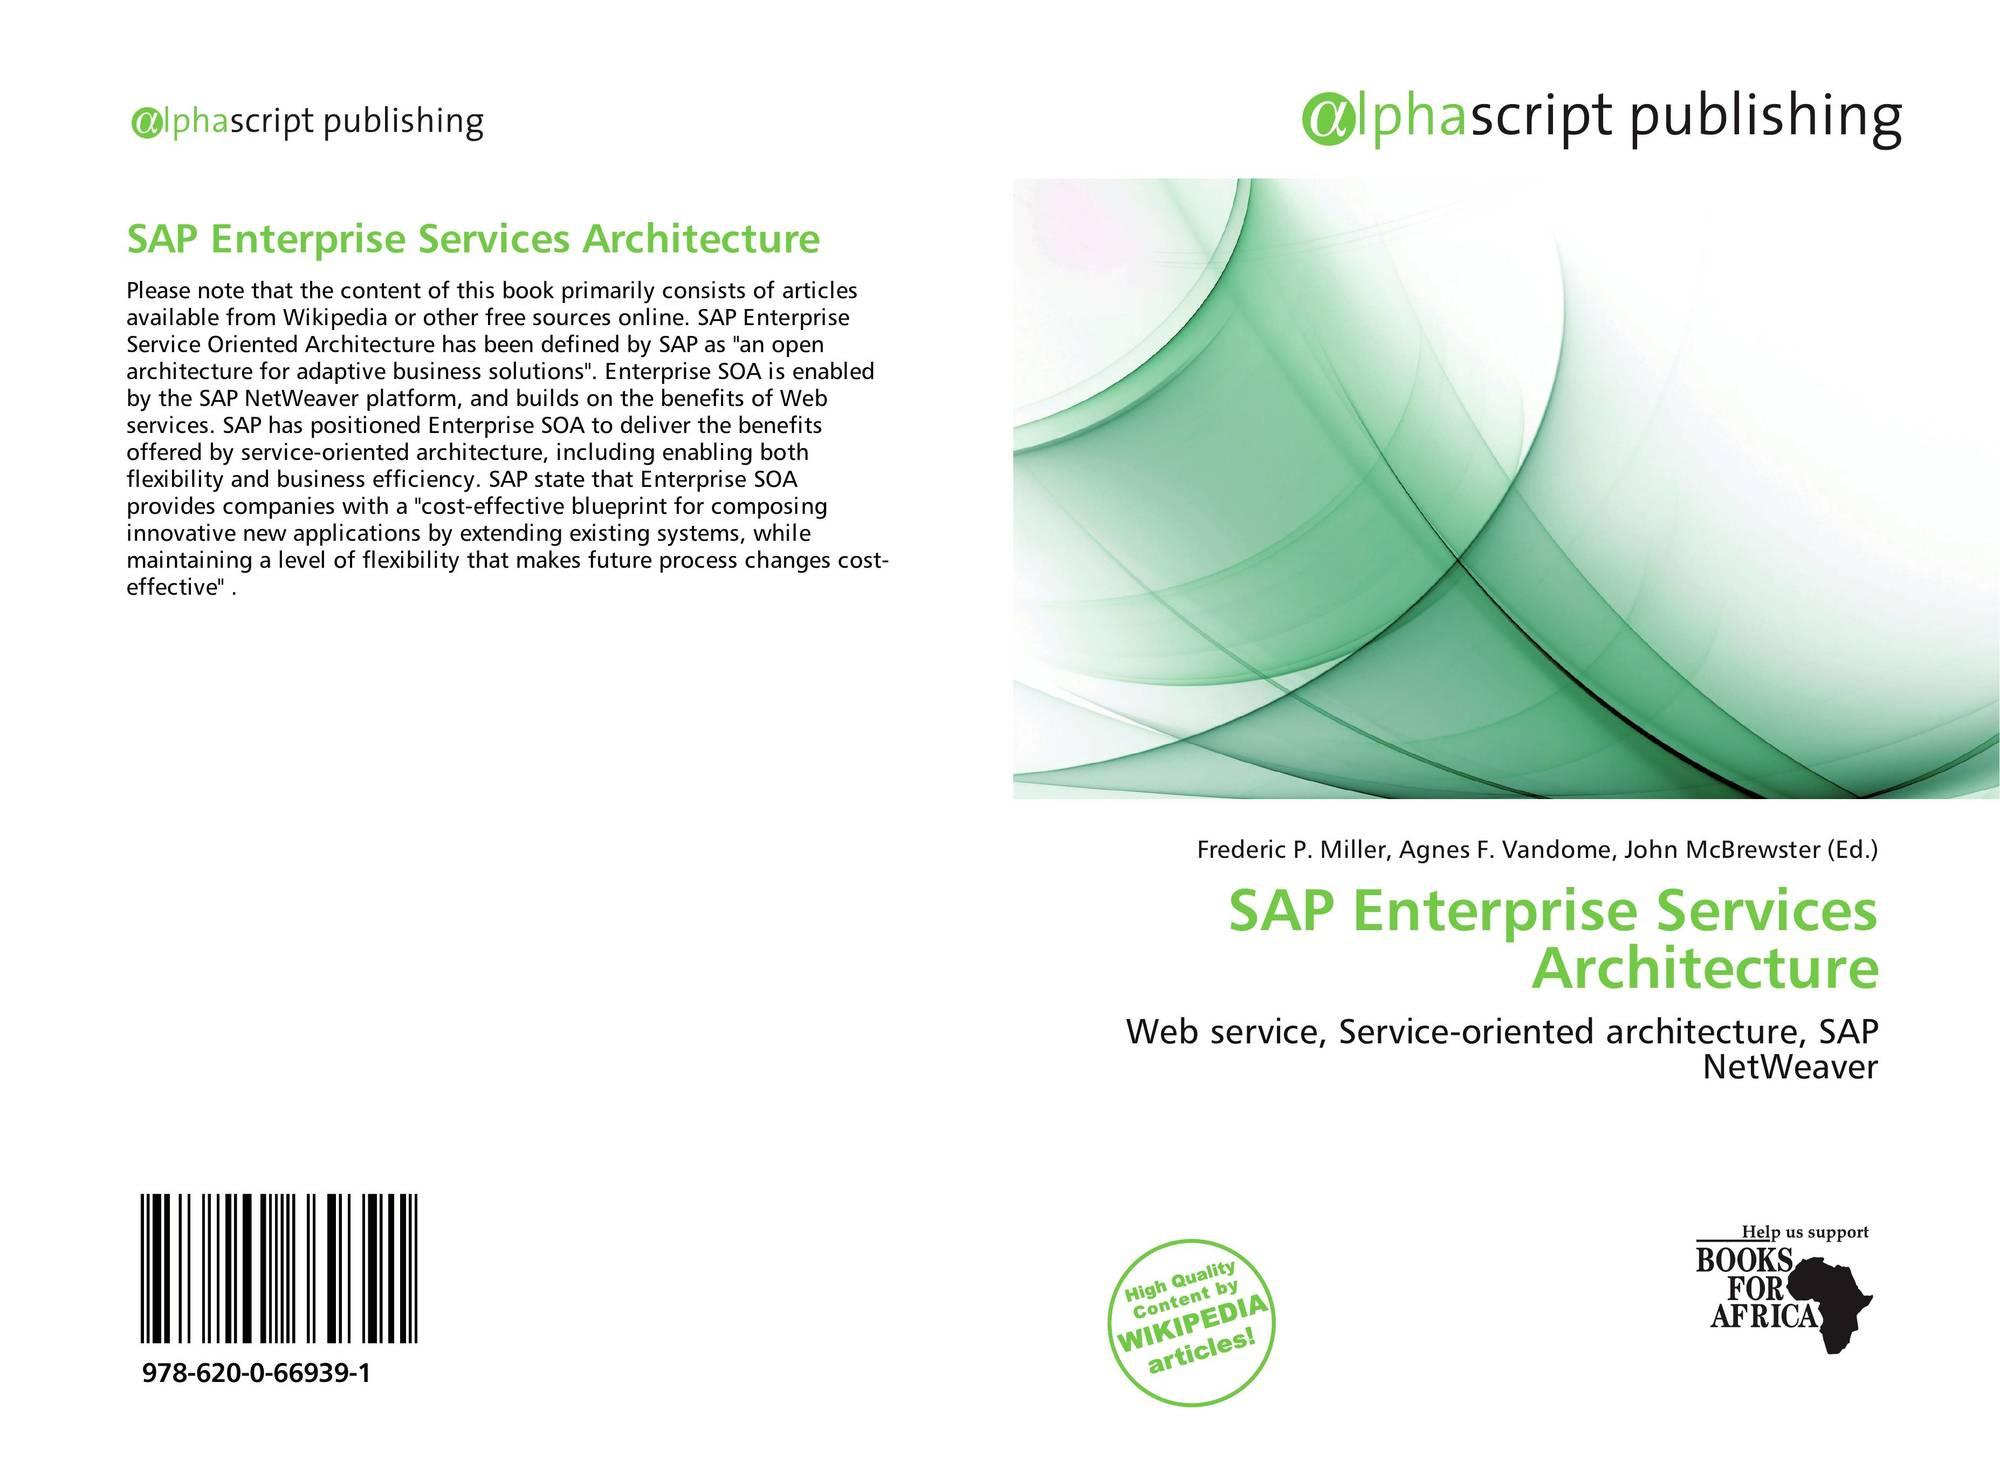 Sap enterprise services architecture 978 620 0 66939 1 6200669392 bookcover of sap enterprise services architecture 9786200669391 malvernweather Gallery